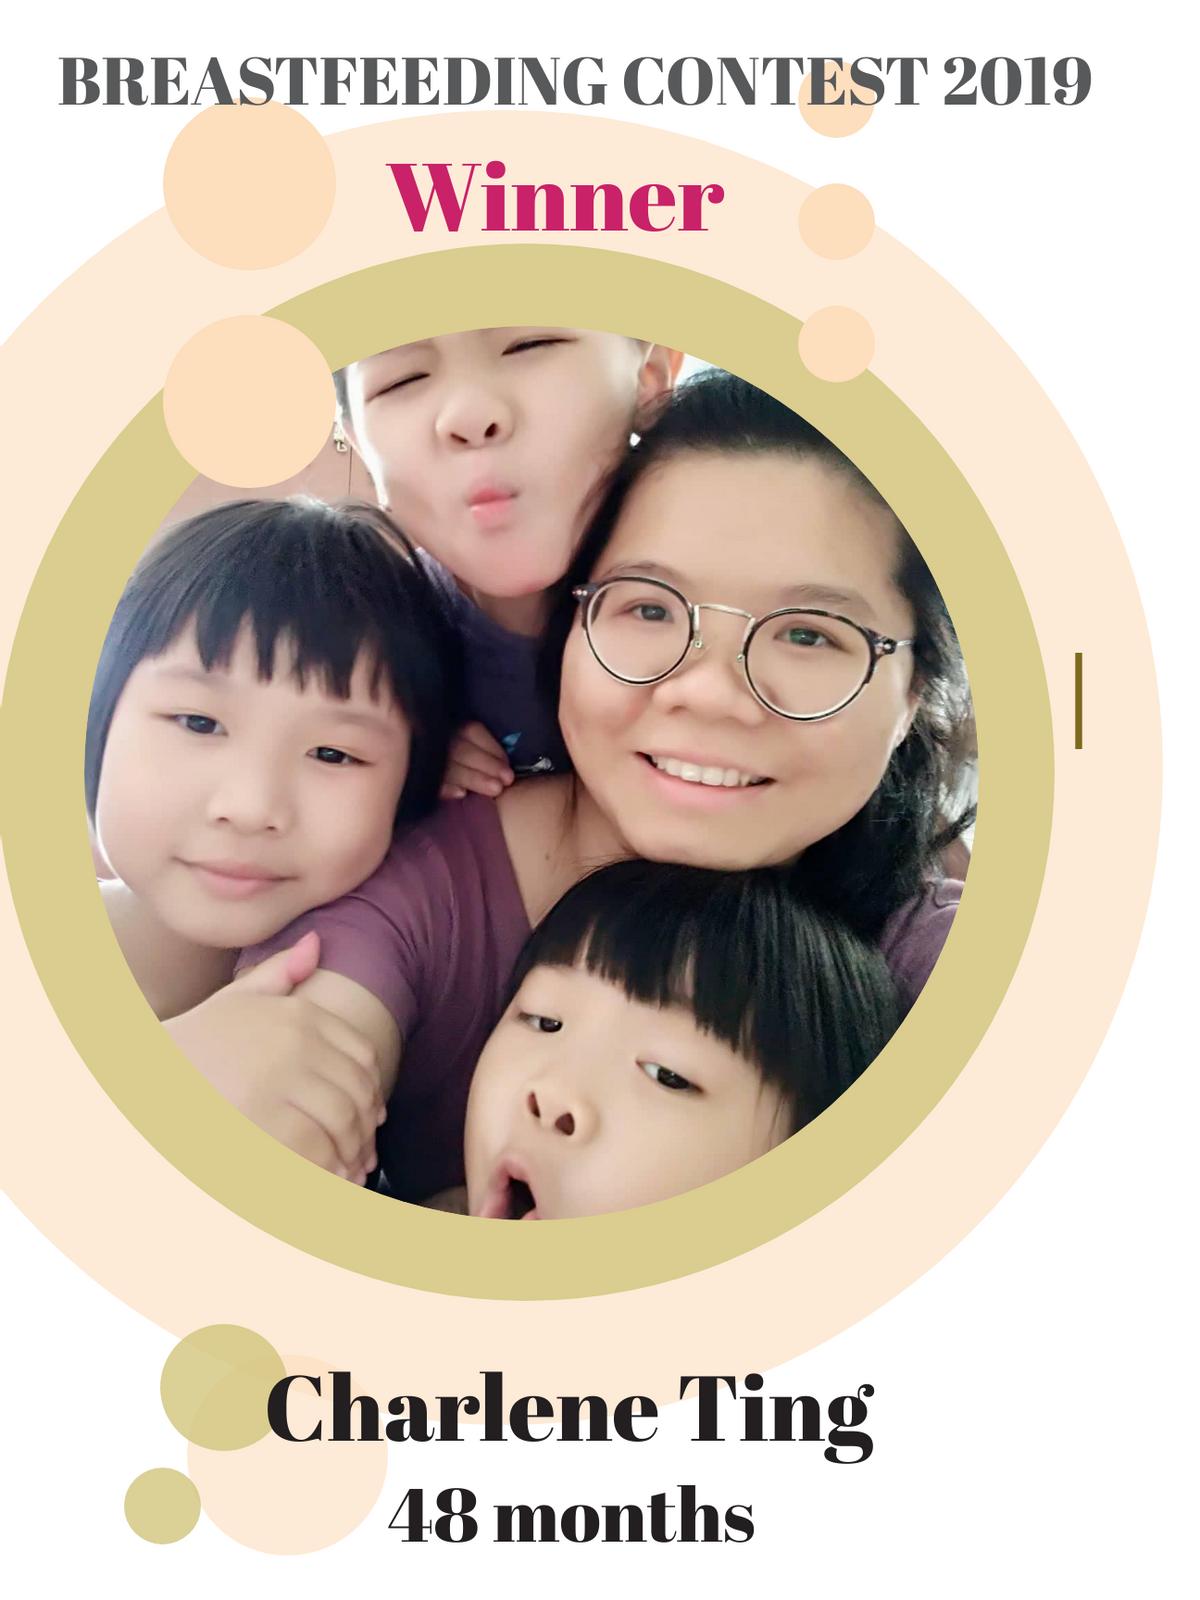 Breastfeeding Contest 2019 - Winner (Charlene Ting)